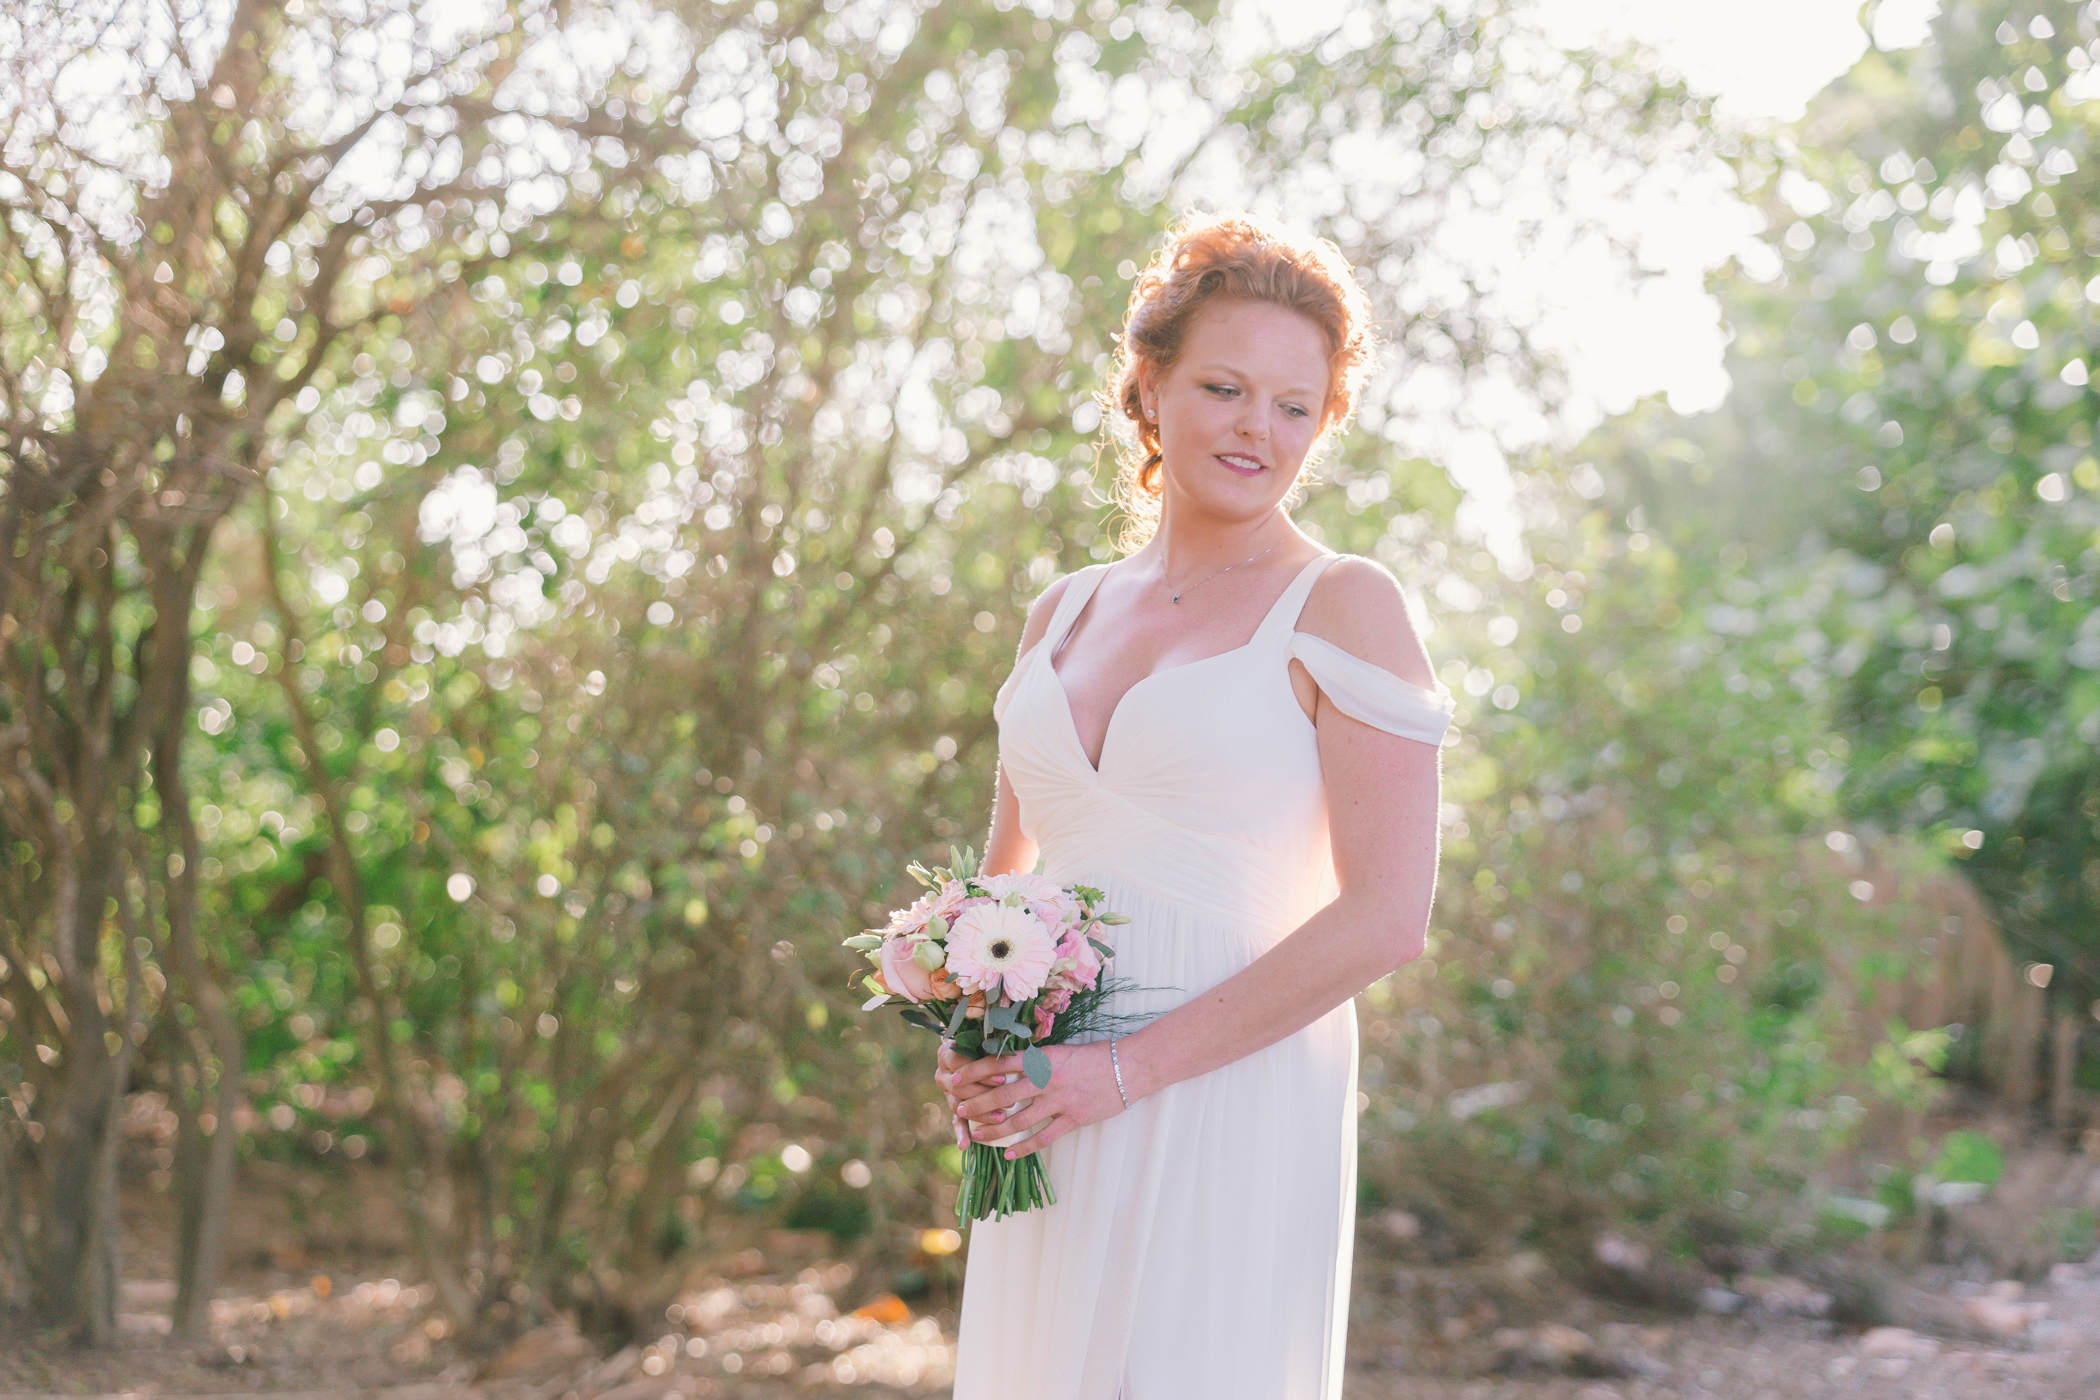 Lido-key-beach-wedding, bride-beach-wedding, sarasota-wedding-photographer